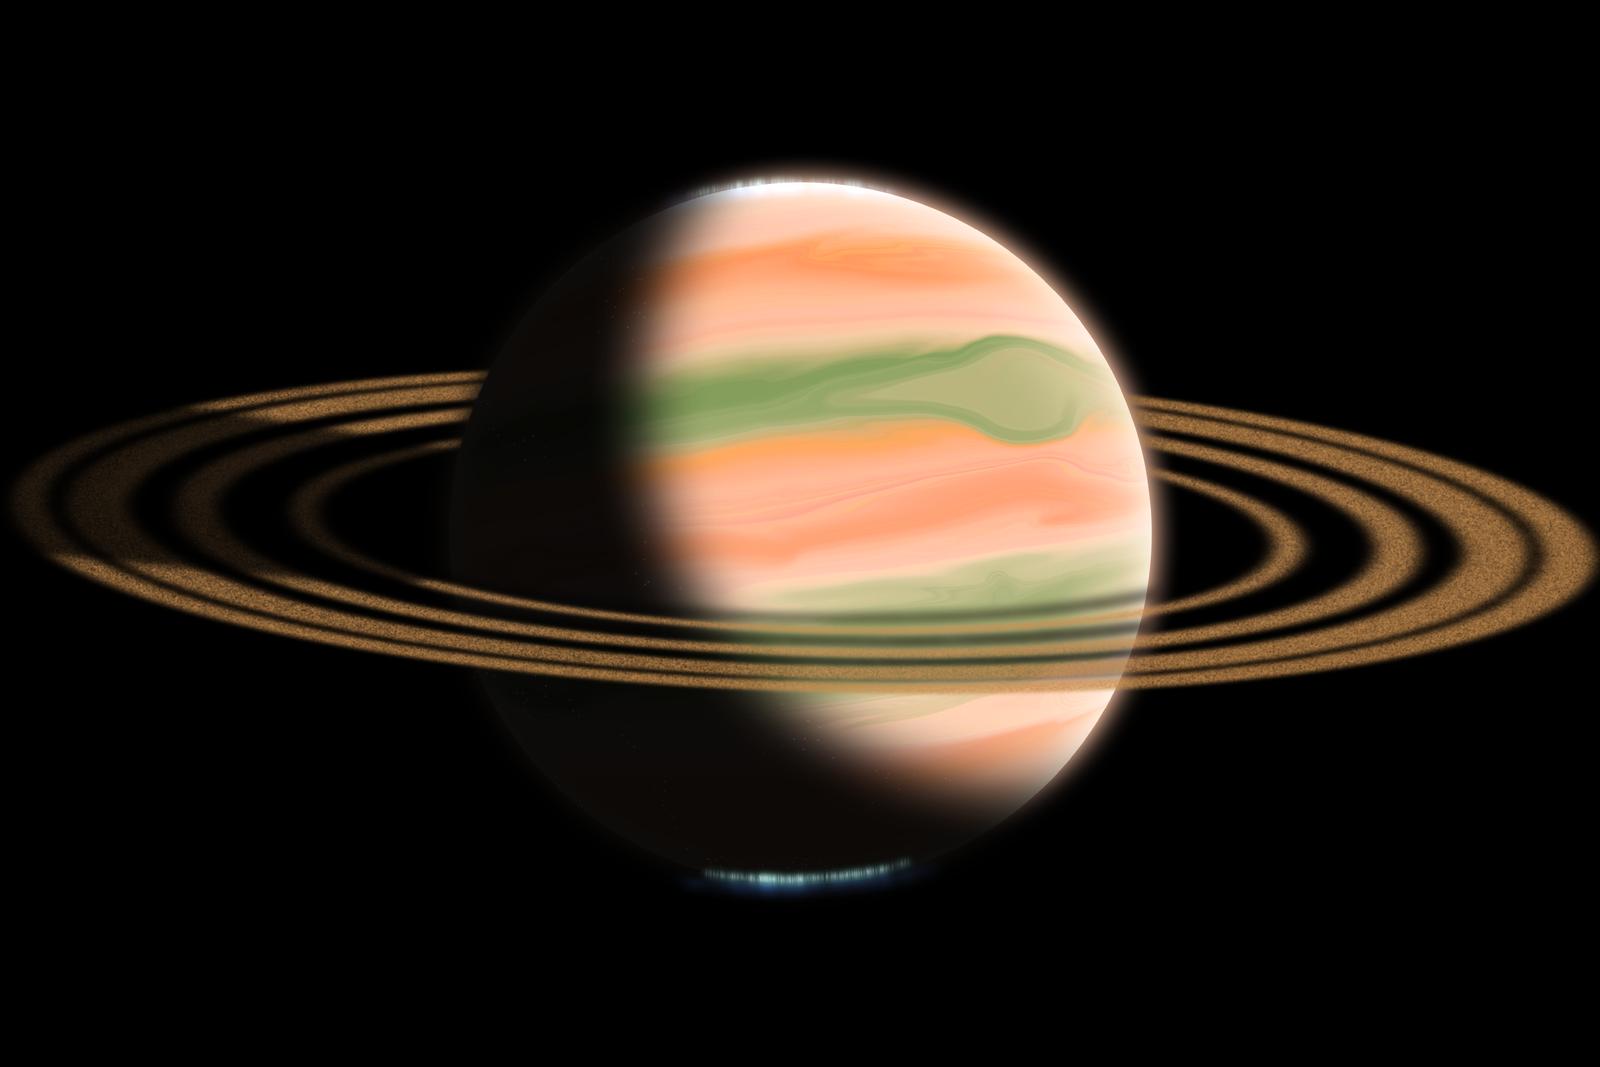 planet_bombora_by_samio85-d5ieelp.png